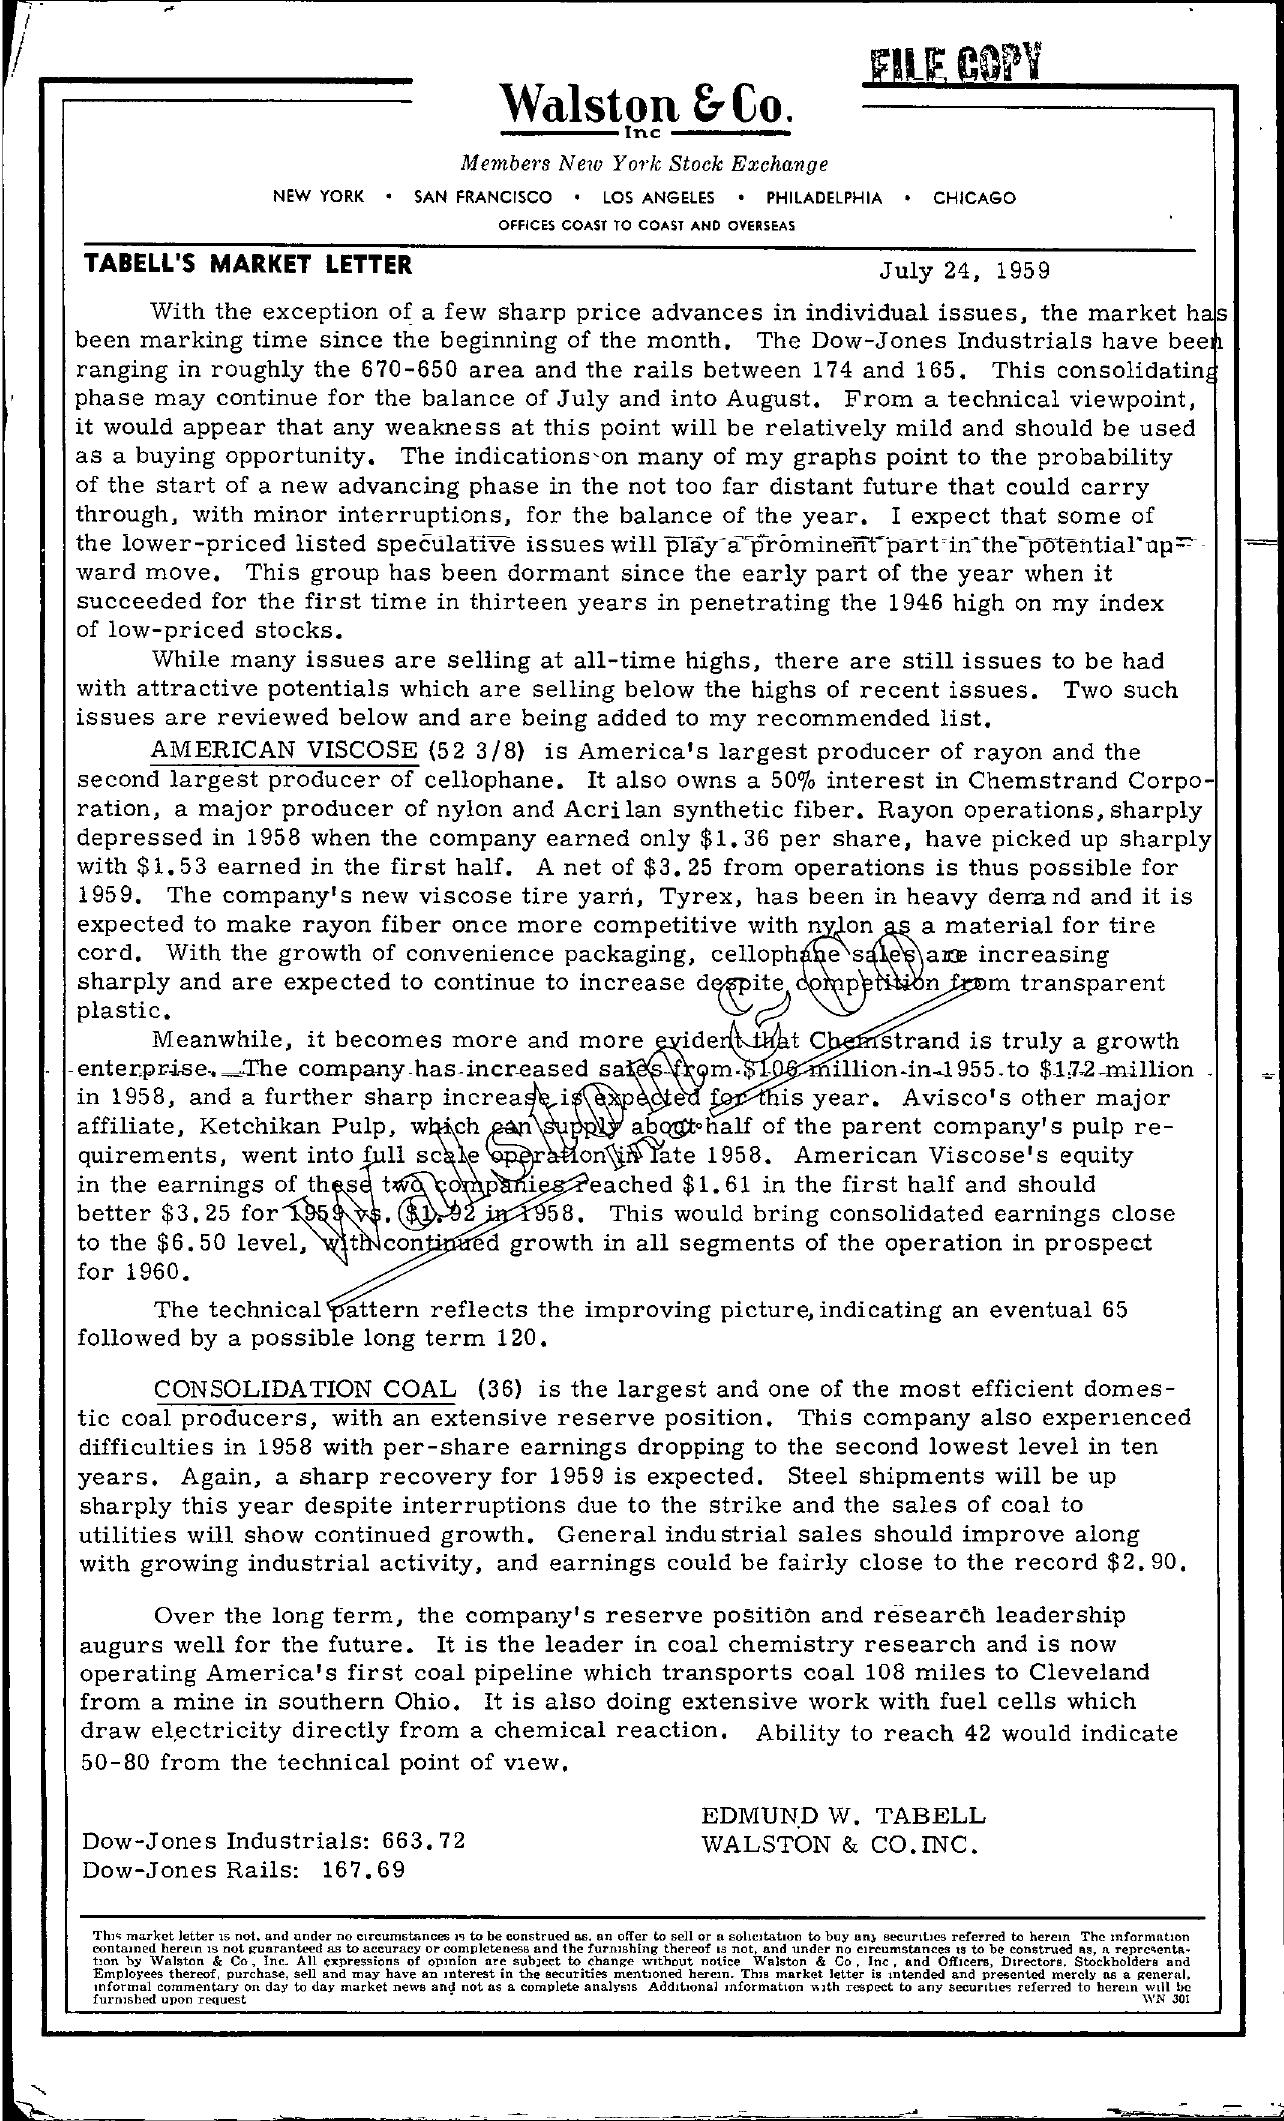 Tabell's Market Letter - July 24, 1959